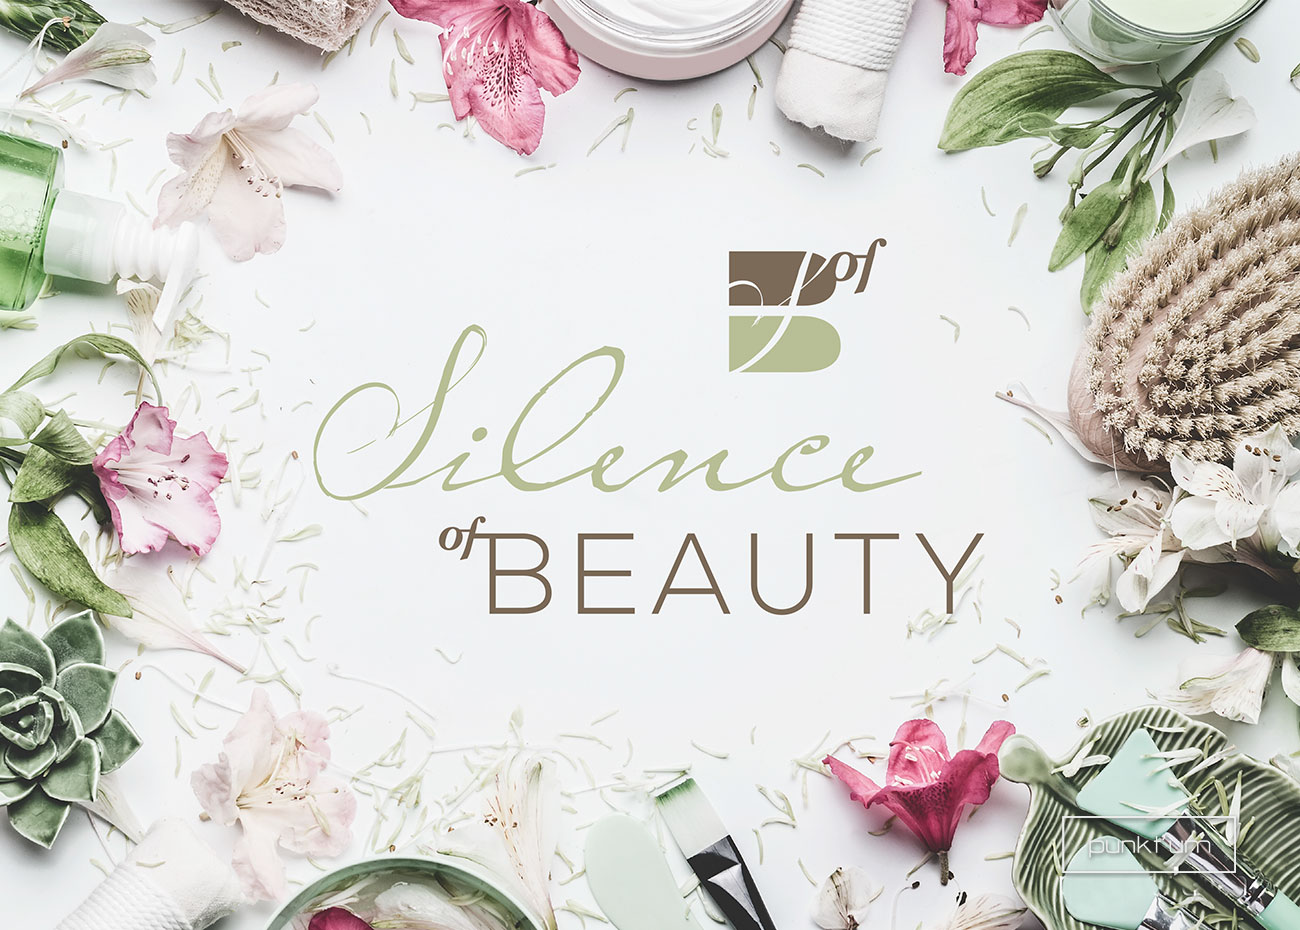 pum_silence-ofbeauty_Ref02